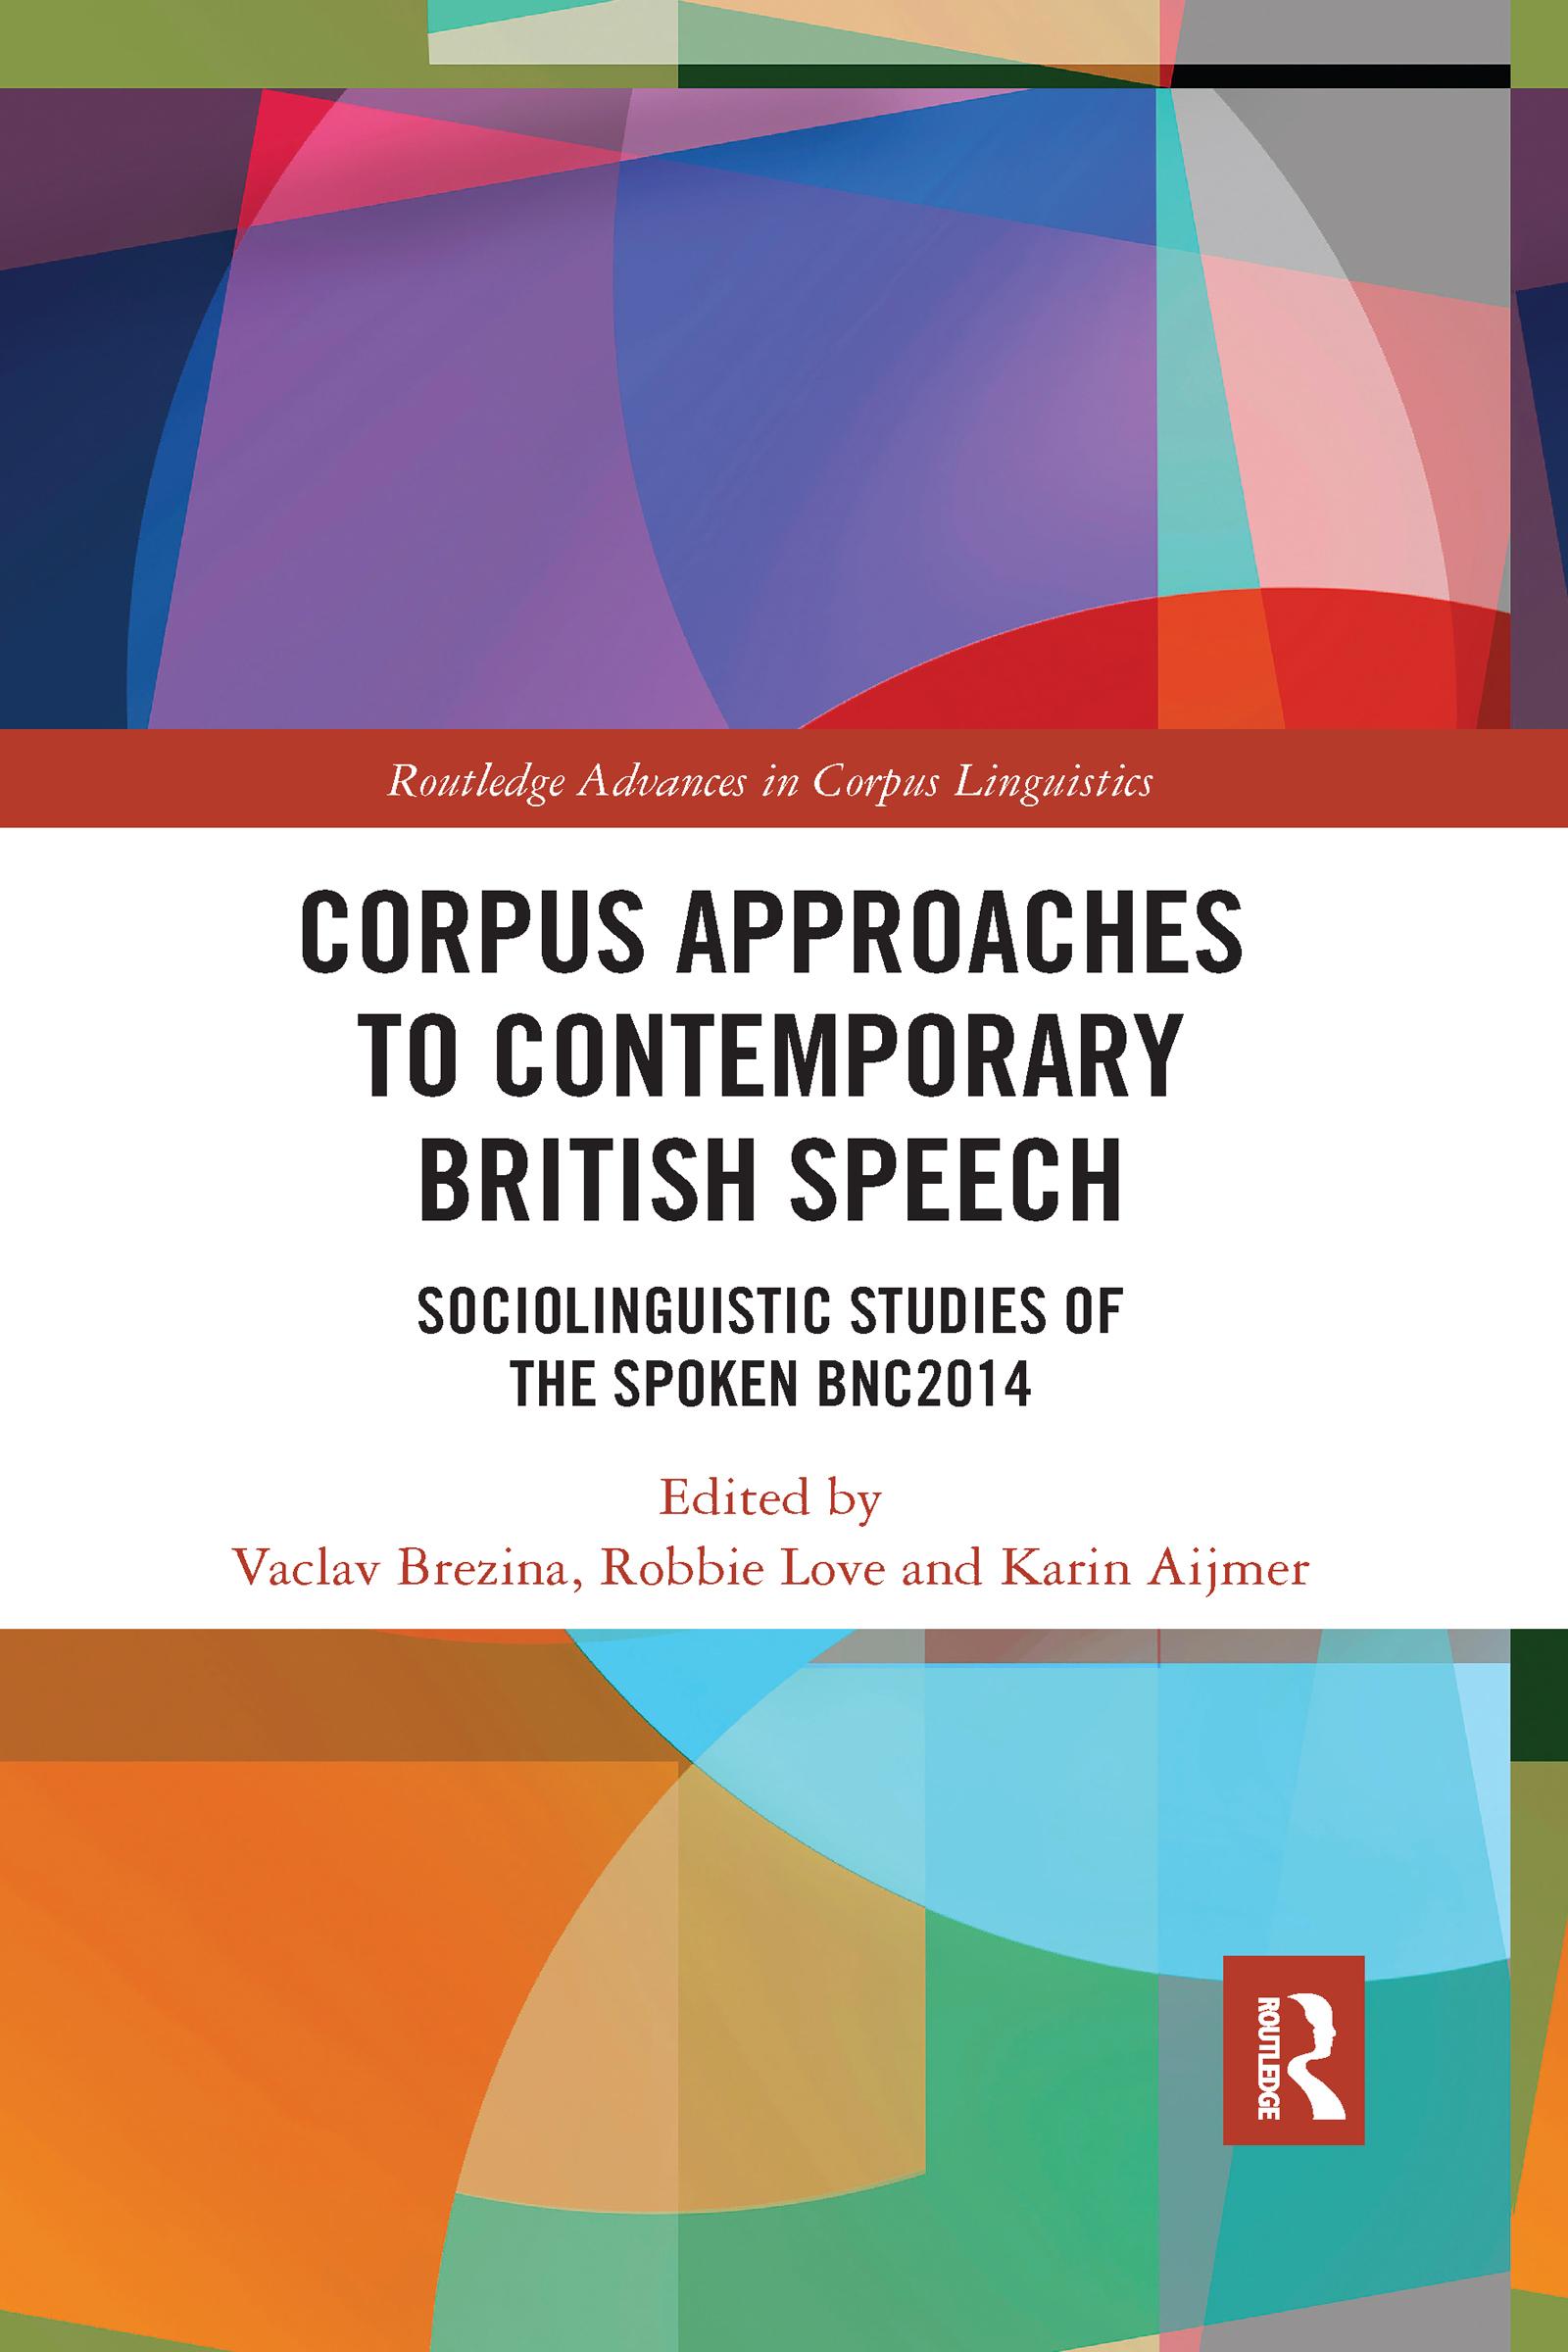 Corpus Approaches to Contemporary British Speech